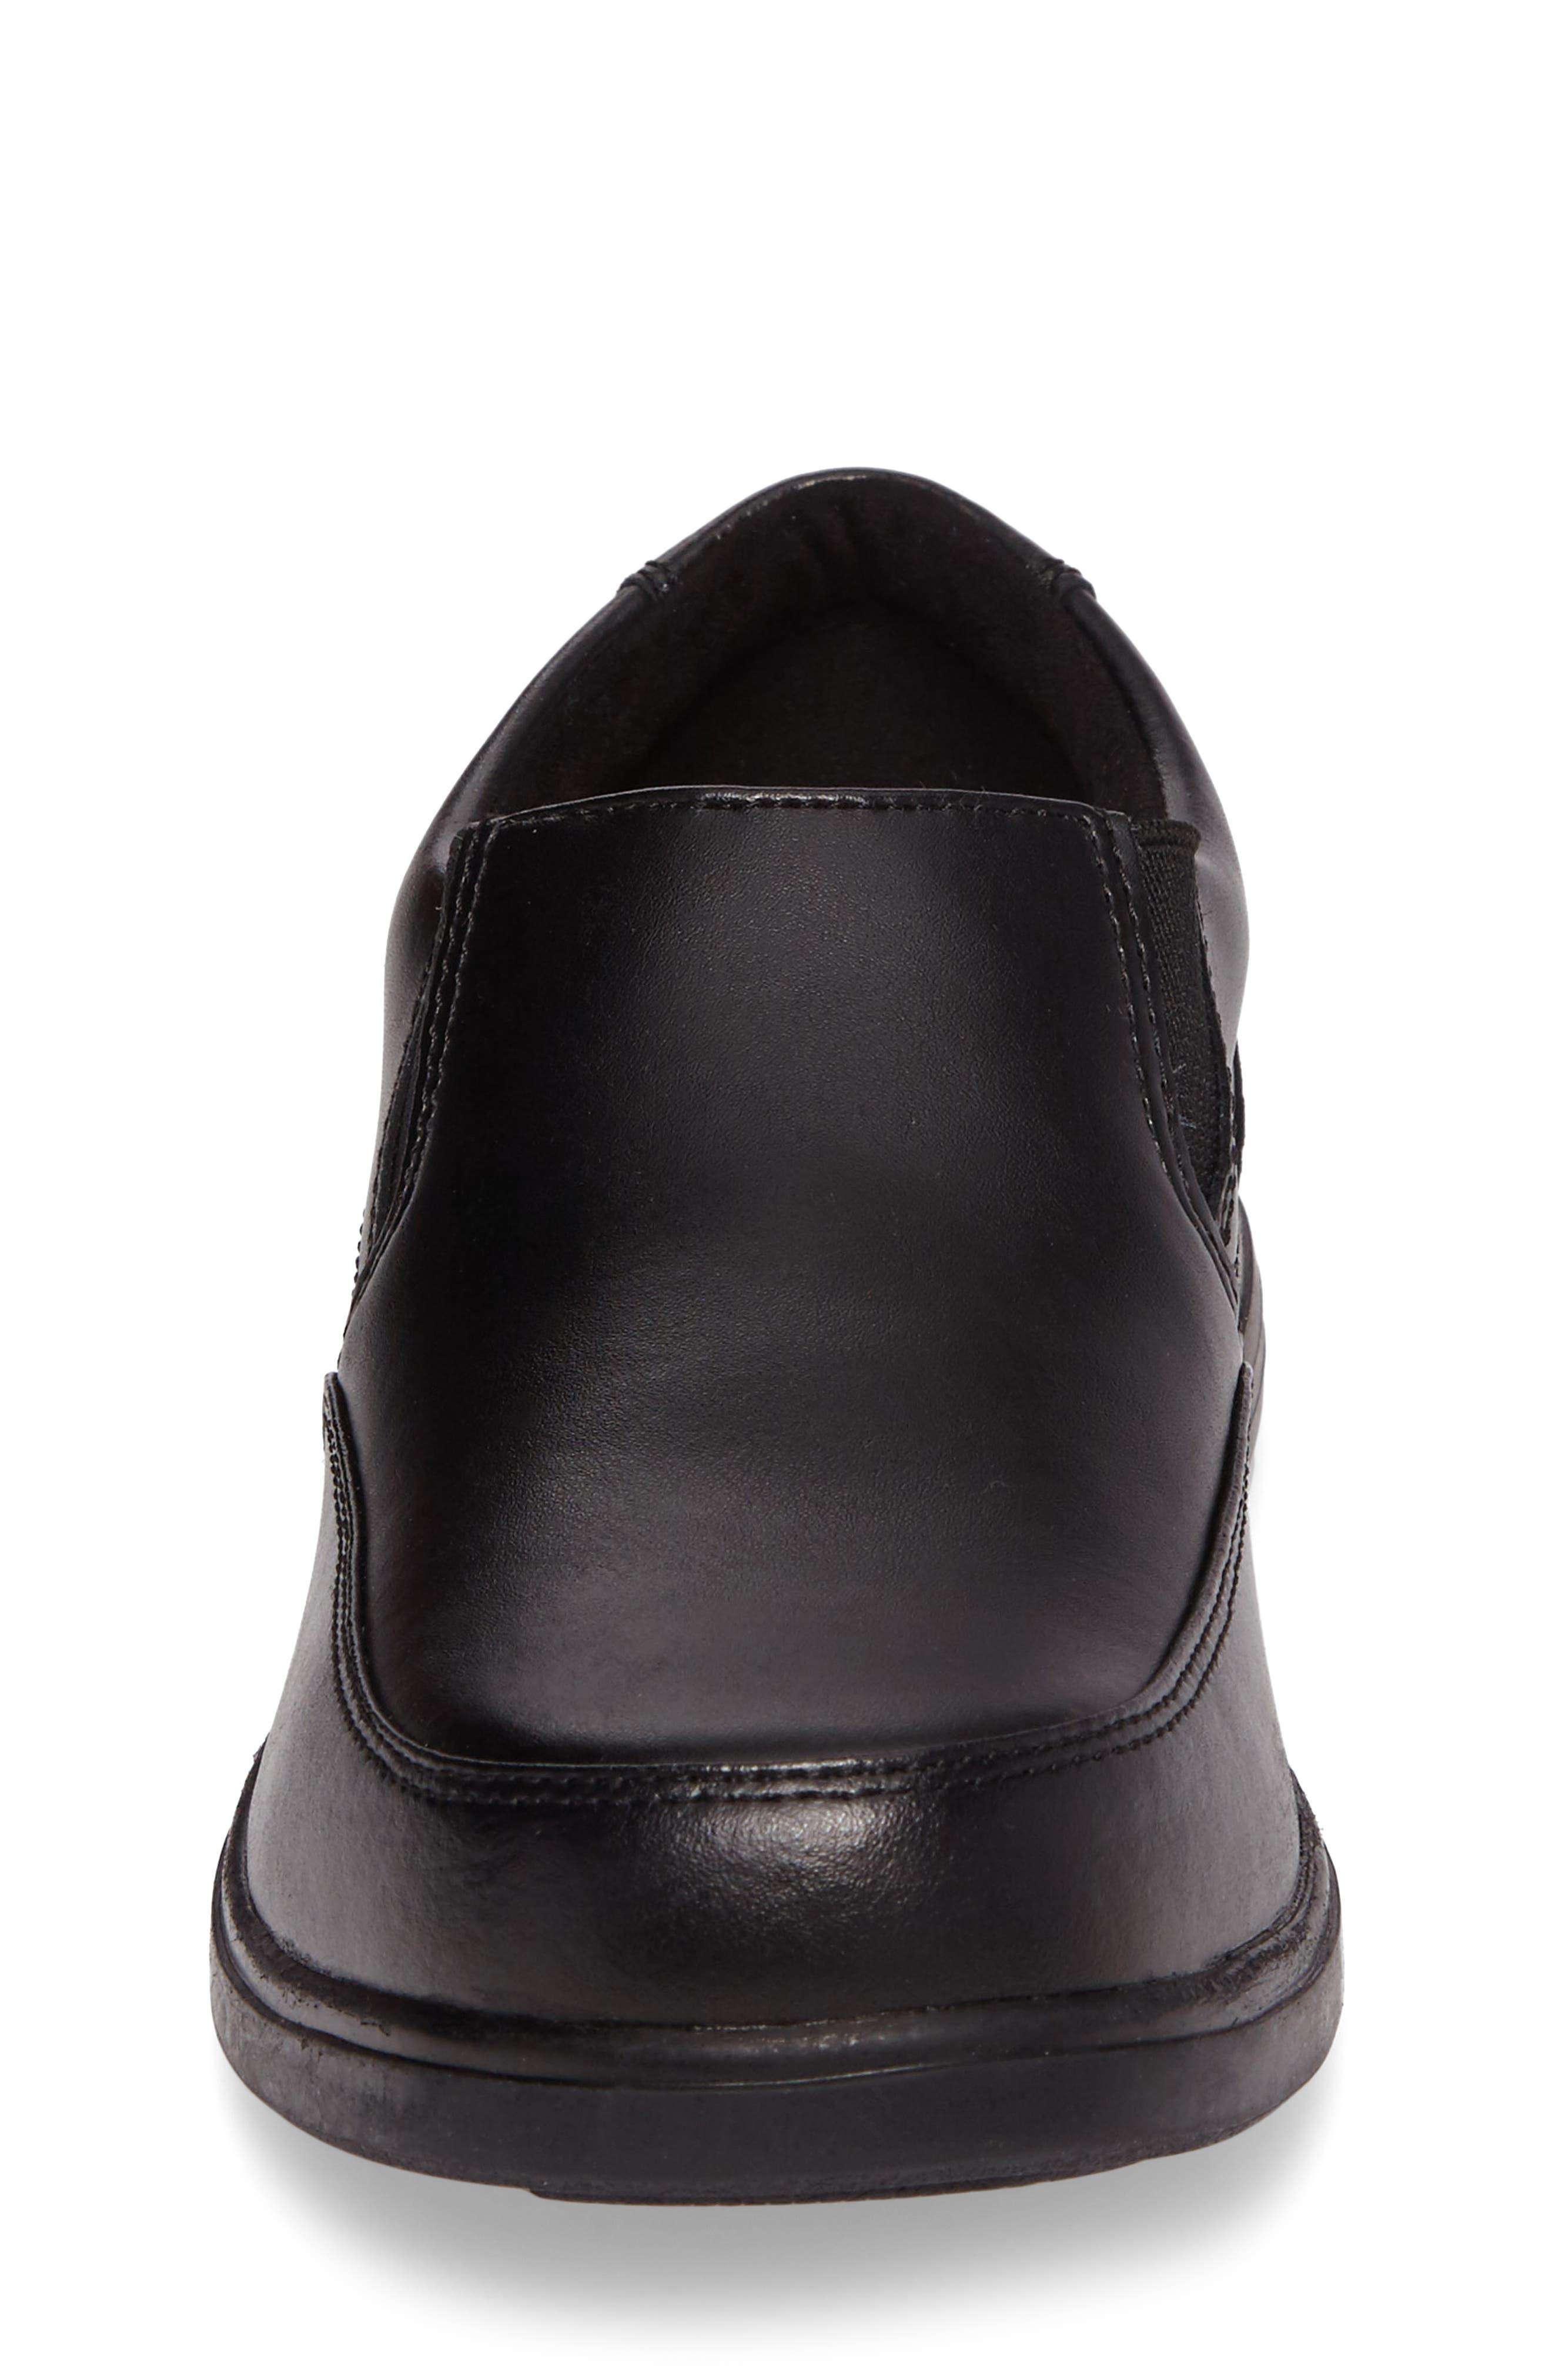 Shane Slip-On Dress Shoe,                             Alternate thumbnail 4, color,                             Black Leather